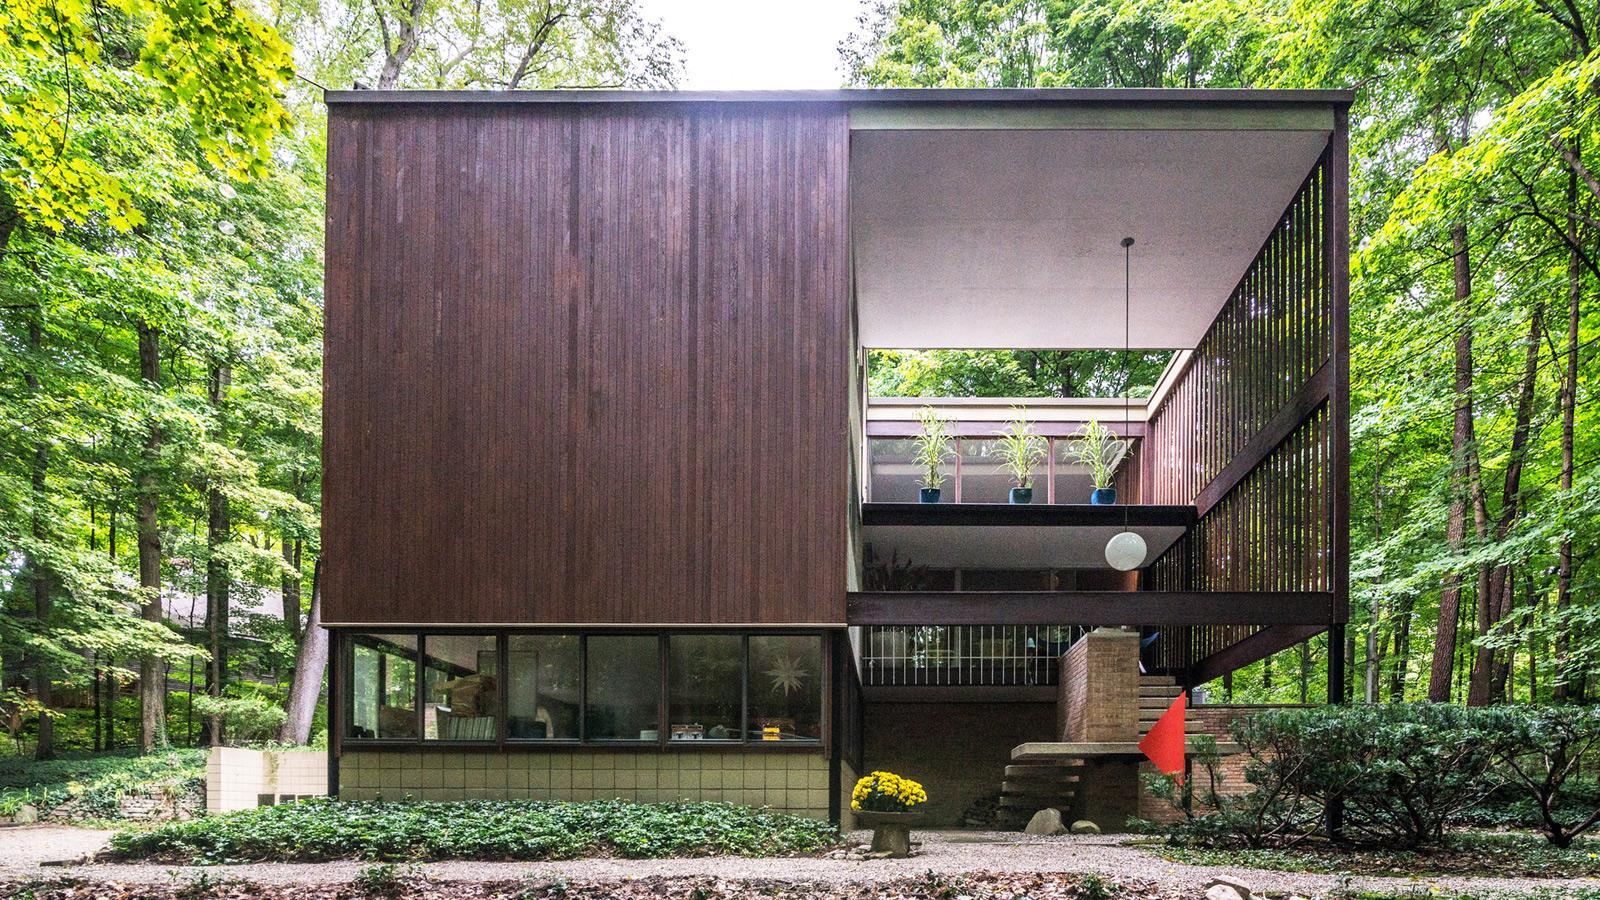 The Tivadar and Dorothy Balogh House exterior